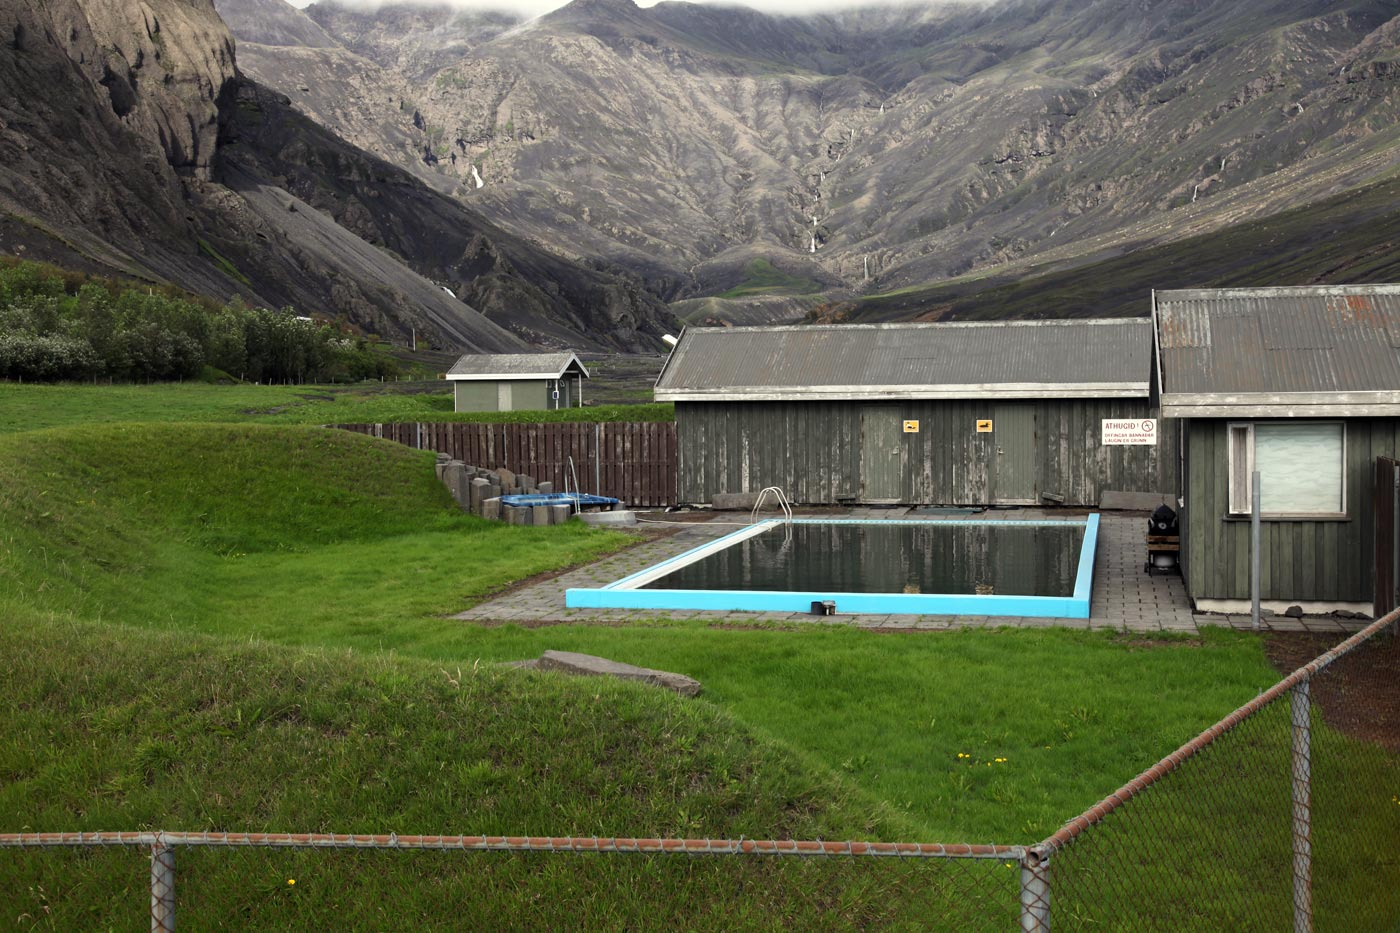 Swimming pool at the foot of  Eyjafjallajokull, Iceland